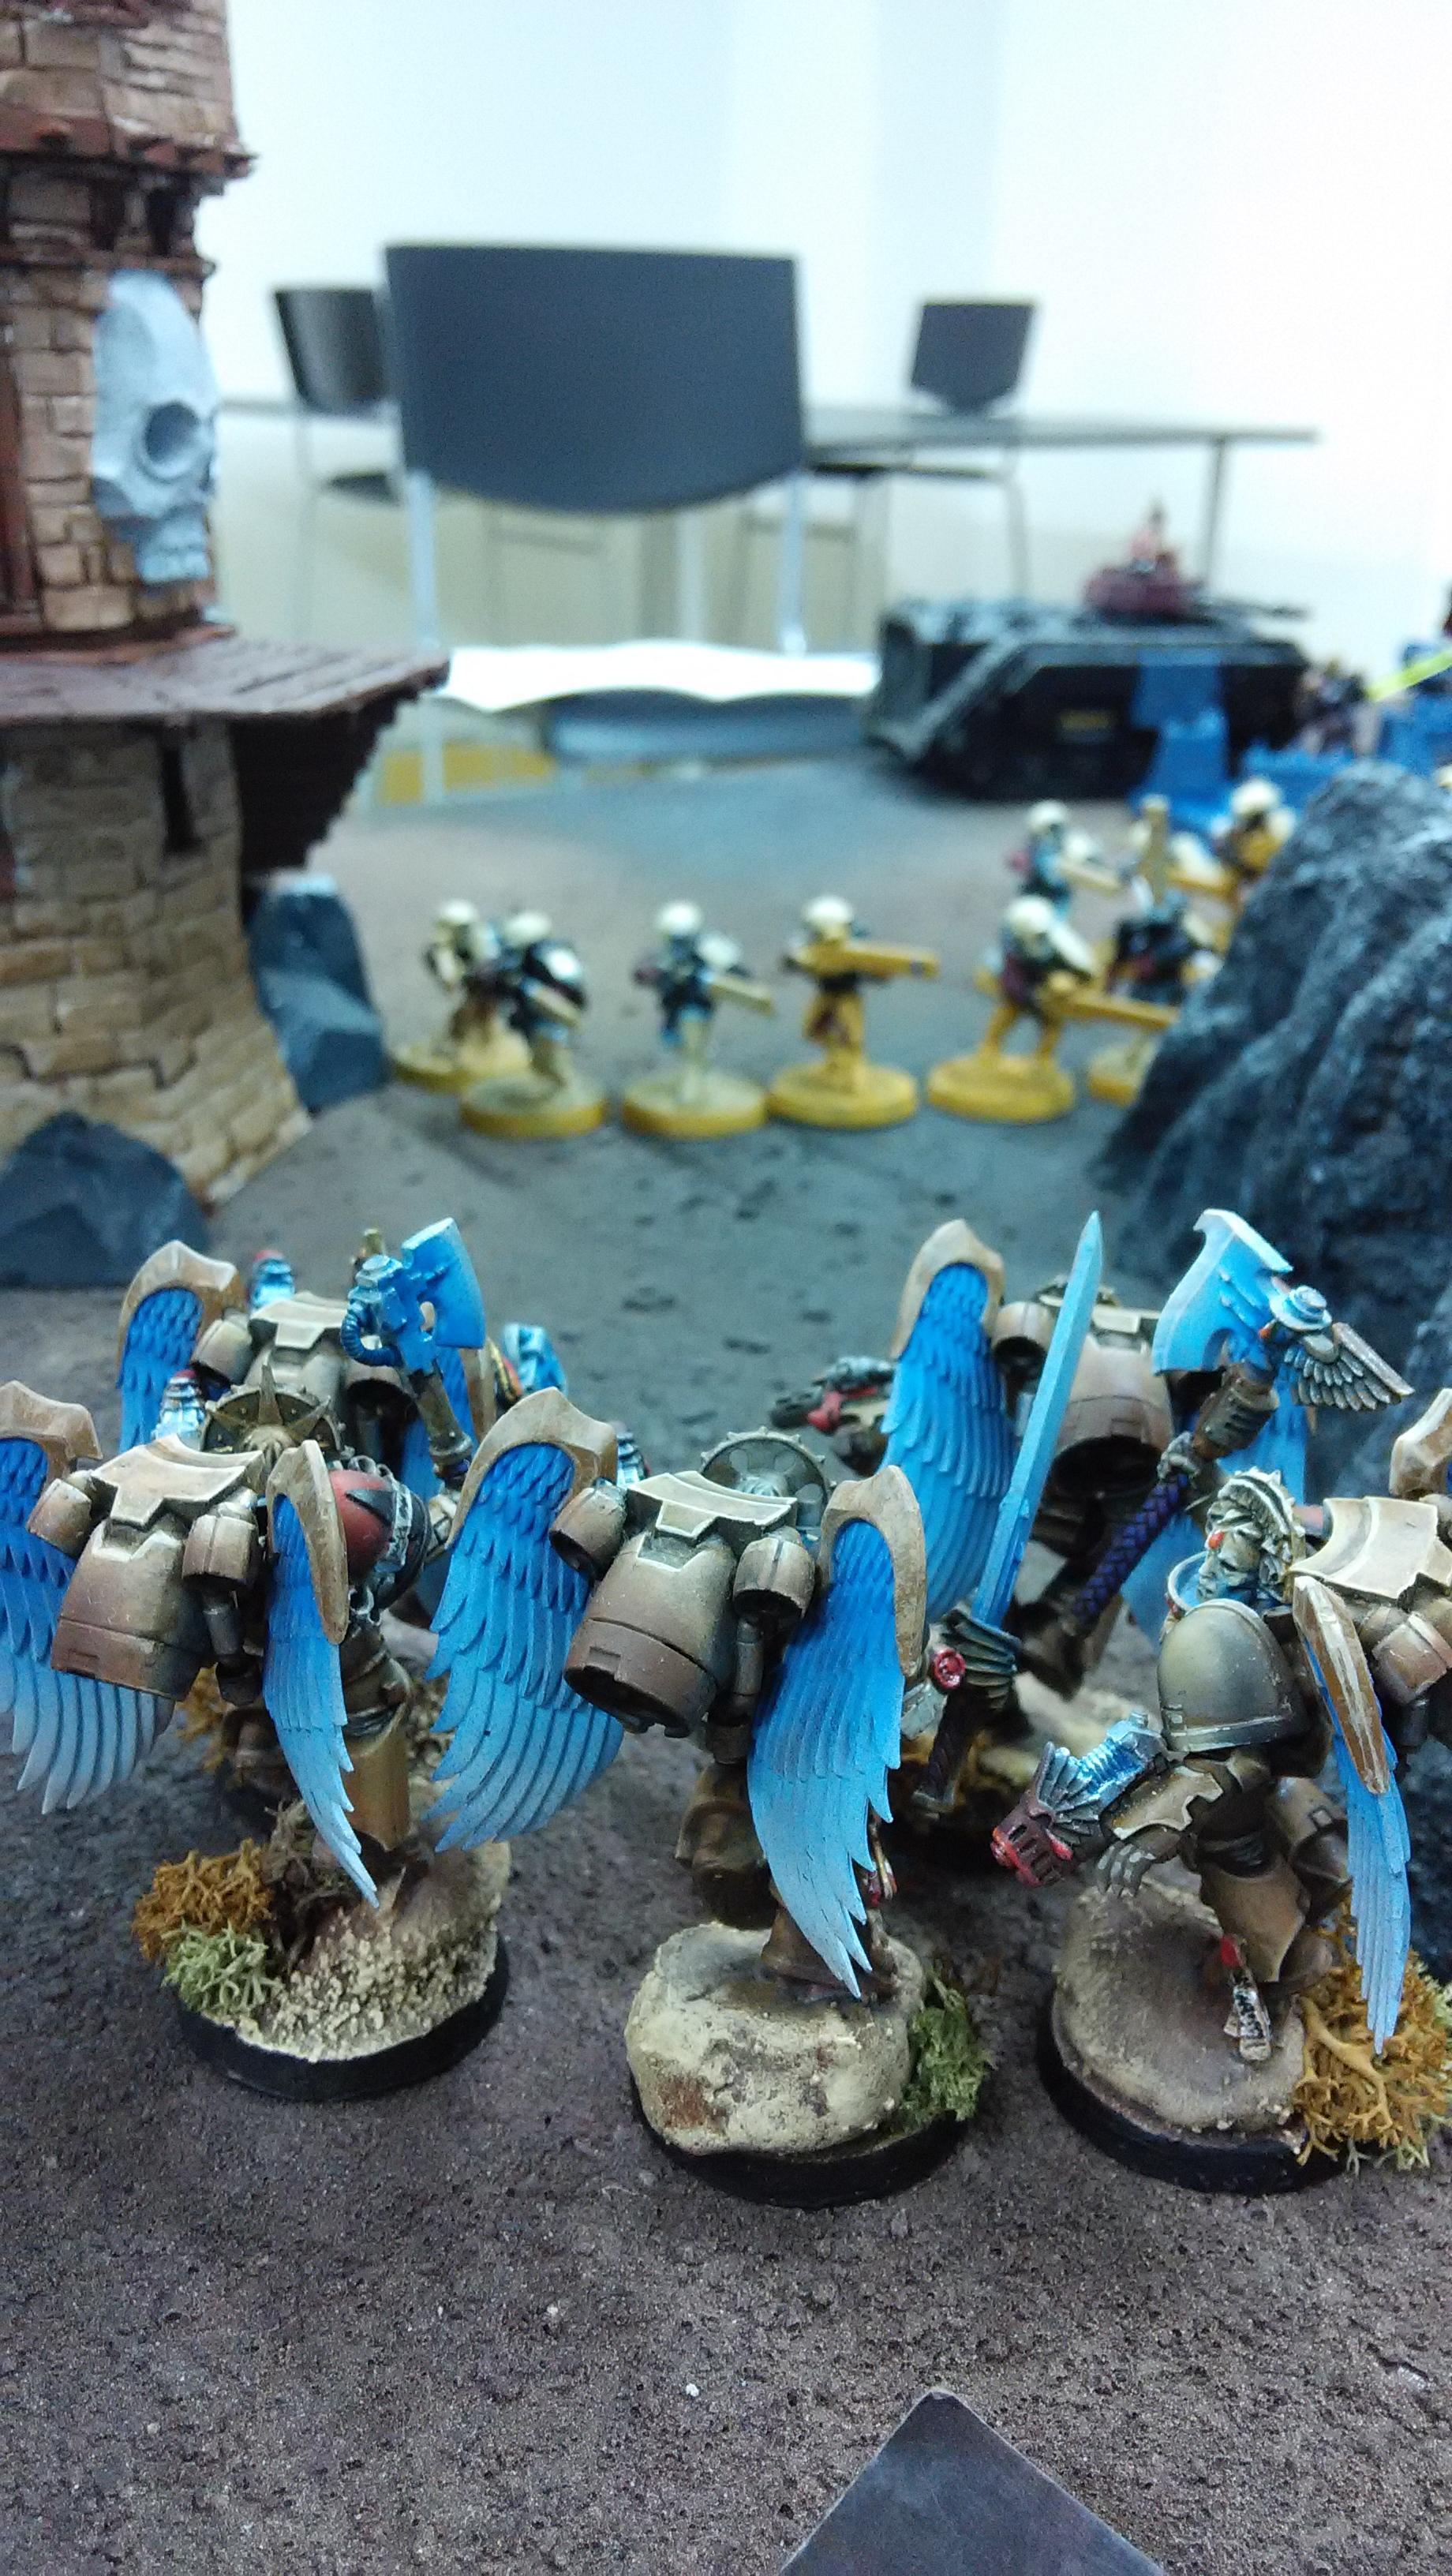 Alathril, Angel, Blood, Guard, Guardia, Sangrientos, Sanguinaria, Sanguinary, Warhammer 40,000, Warhammer Fantasy